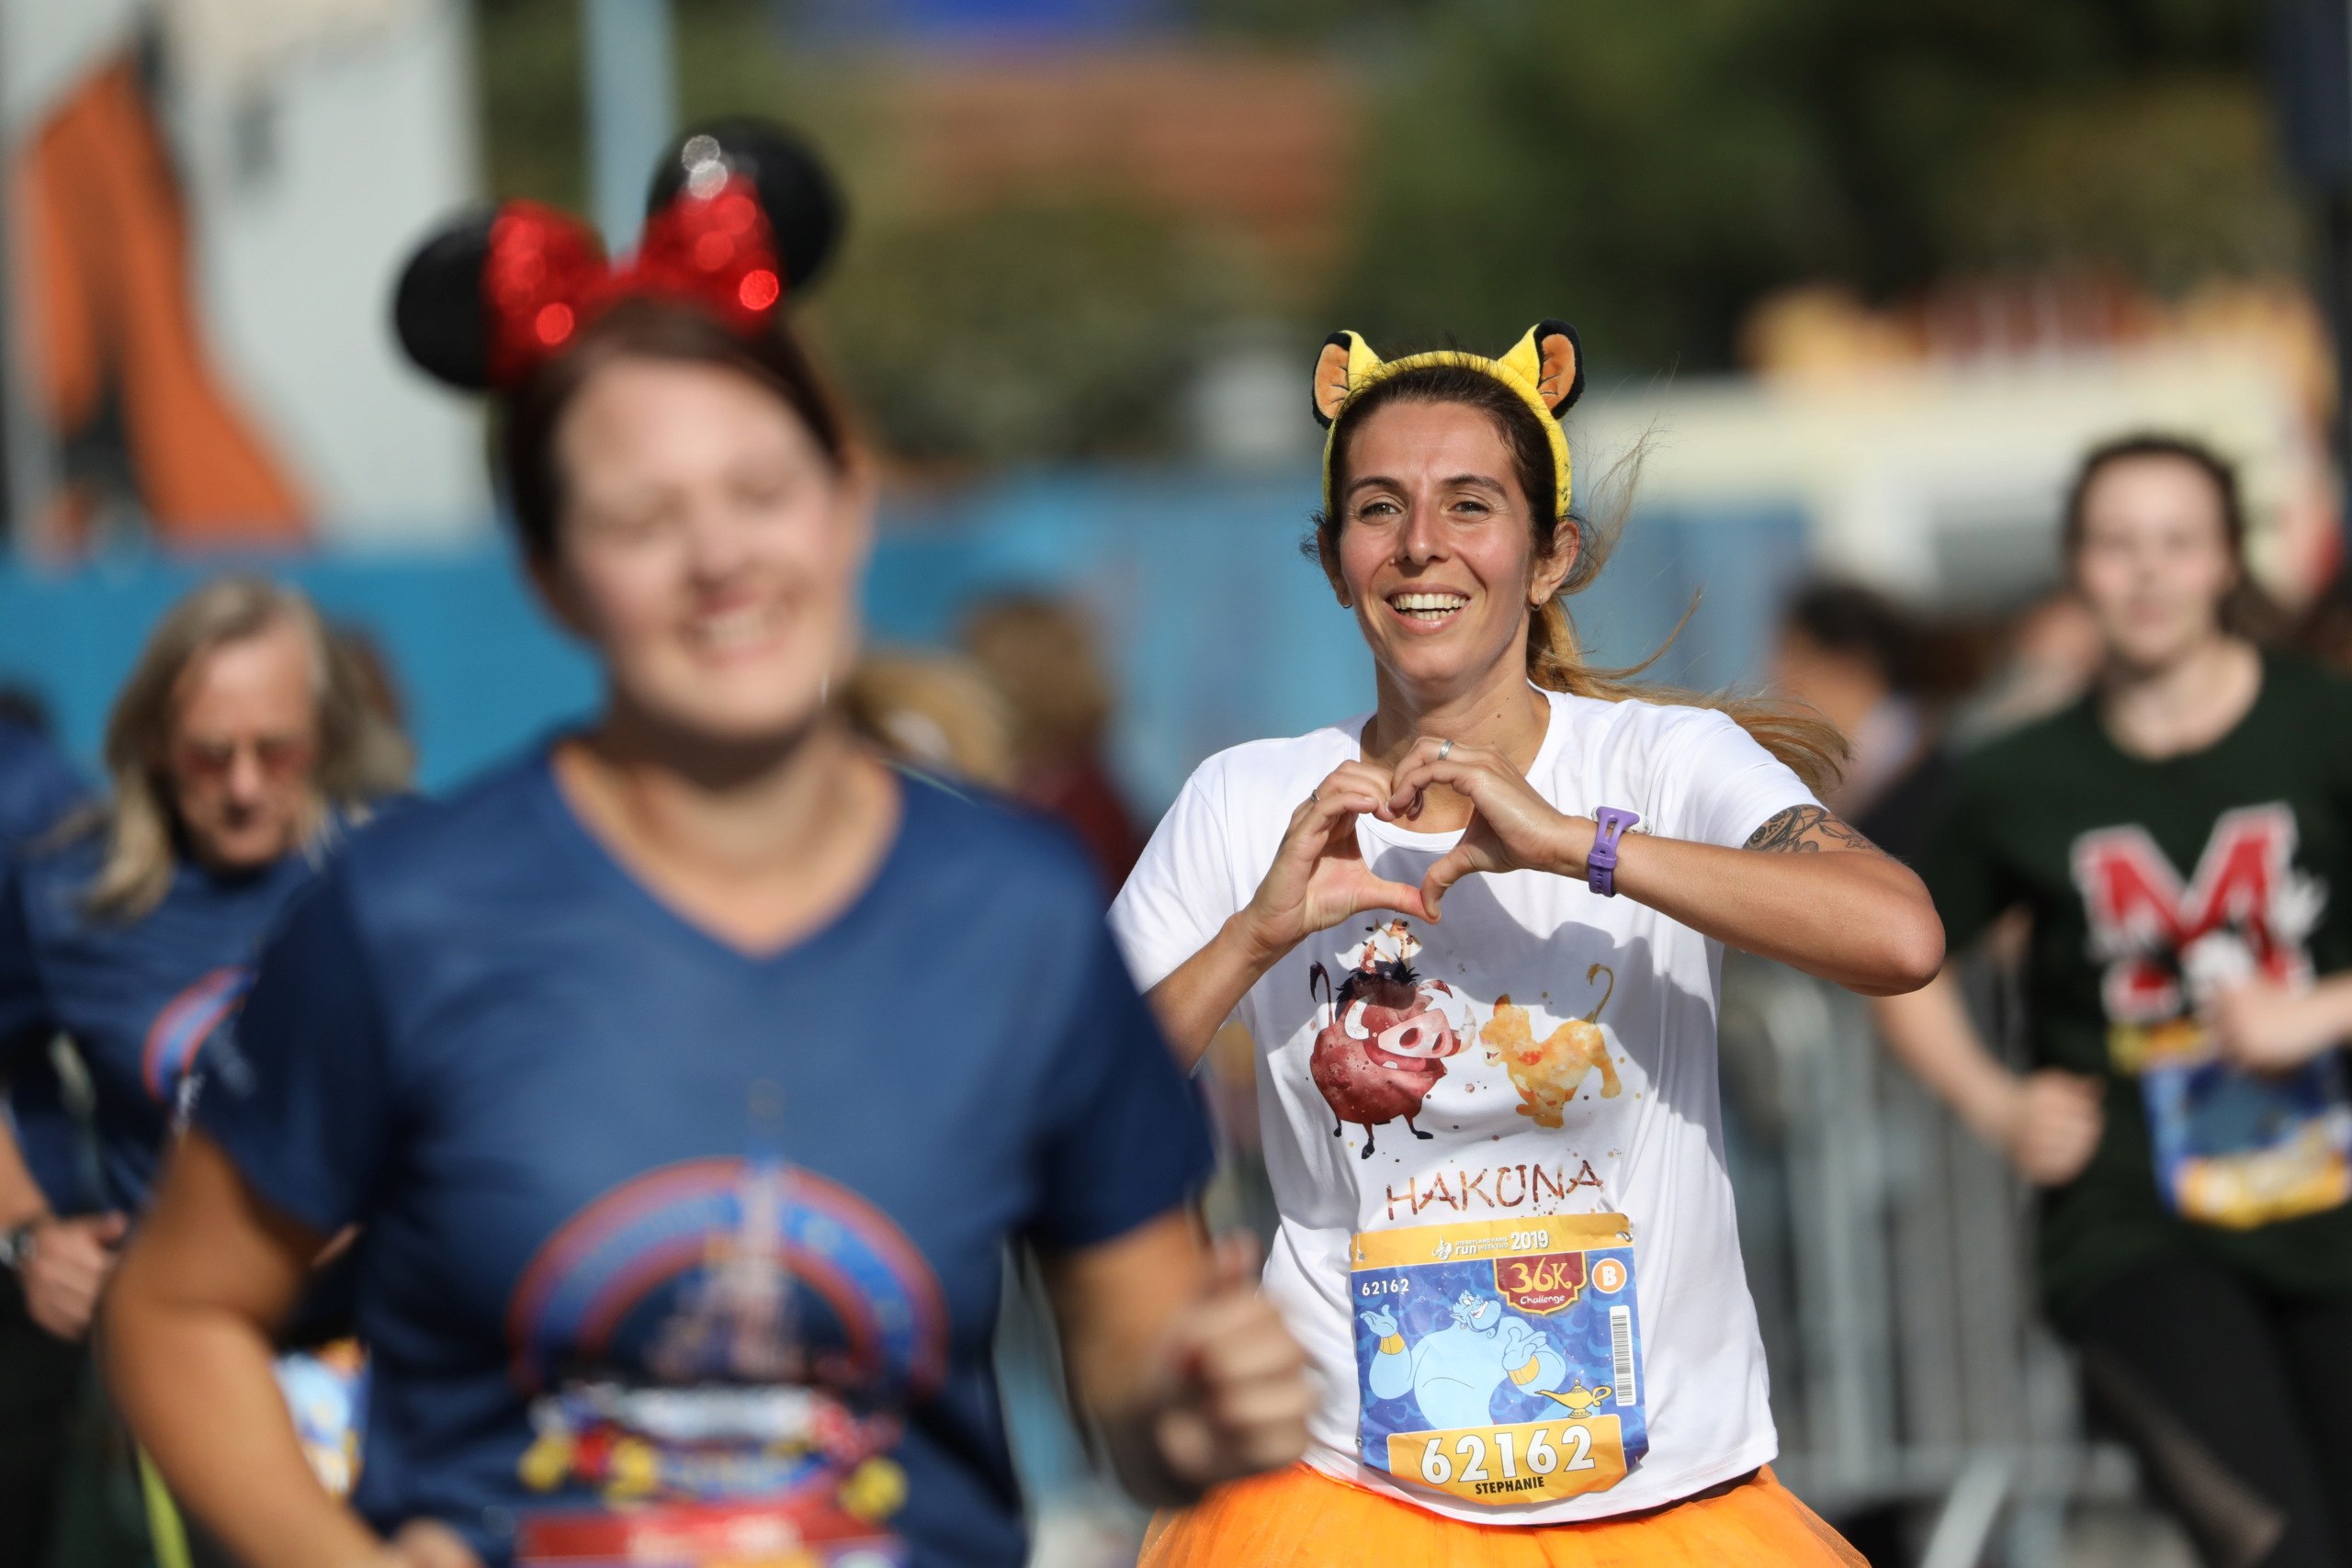 2019 - Disneyland Paris Run Weekend - Pagina 3 21k_1210